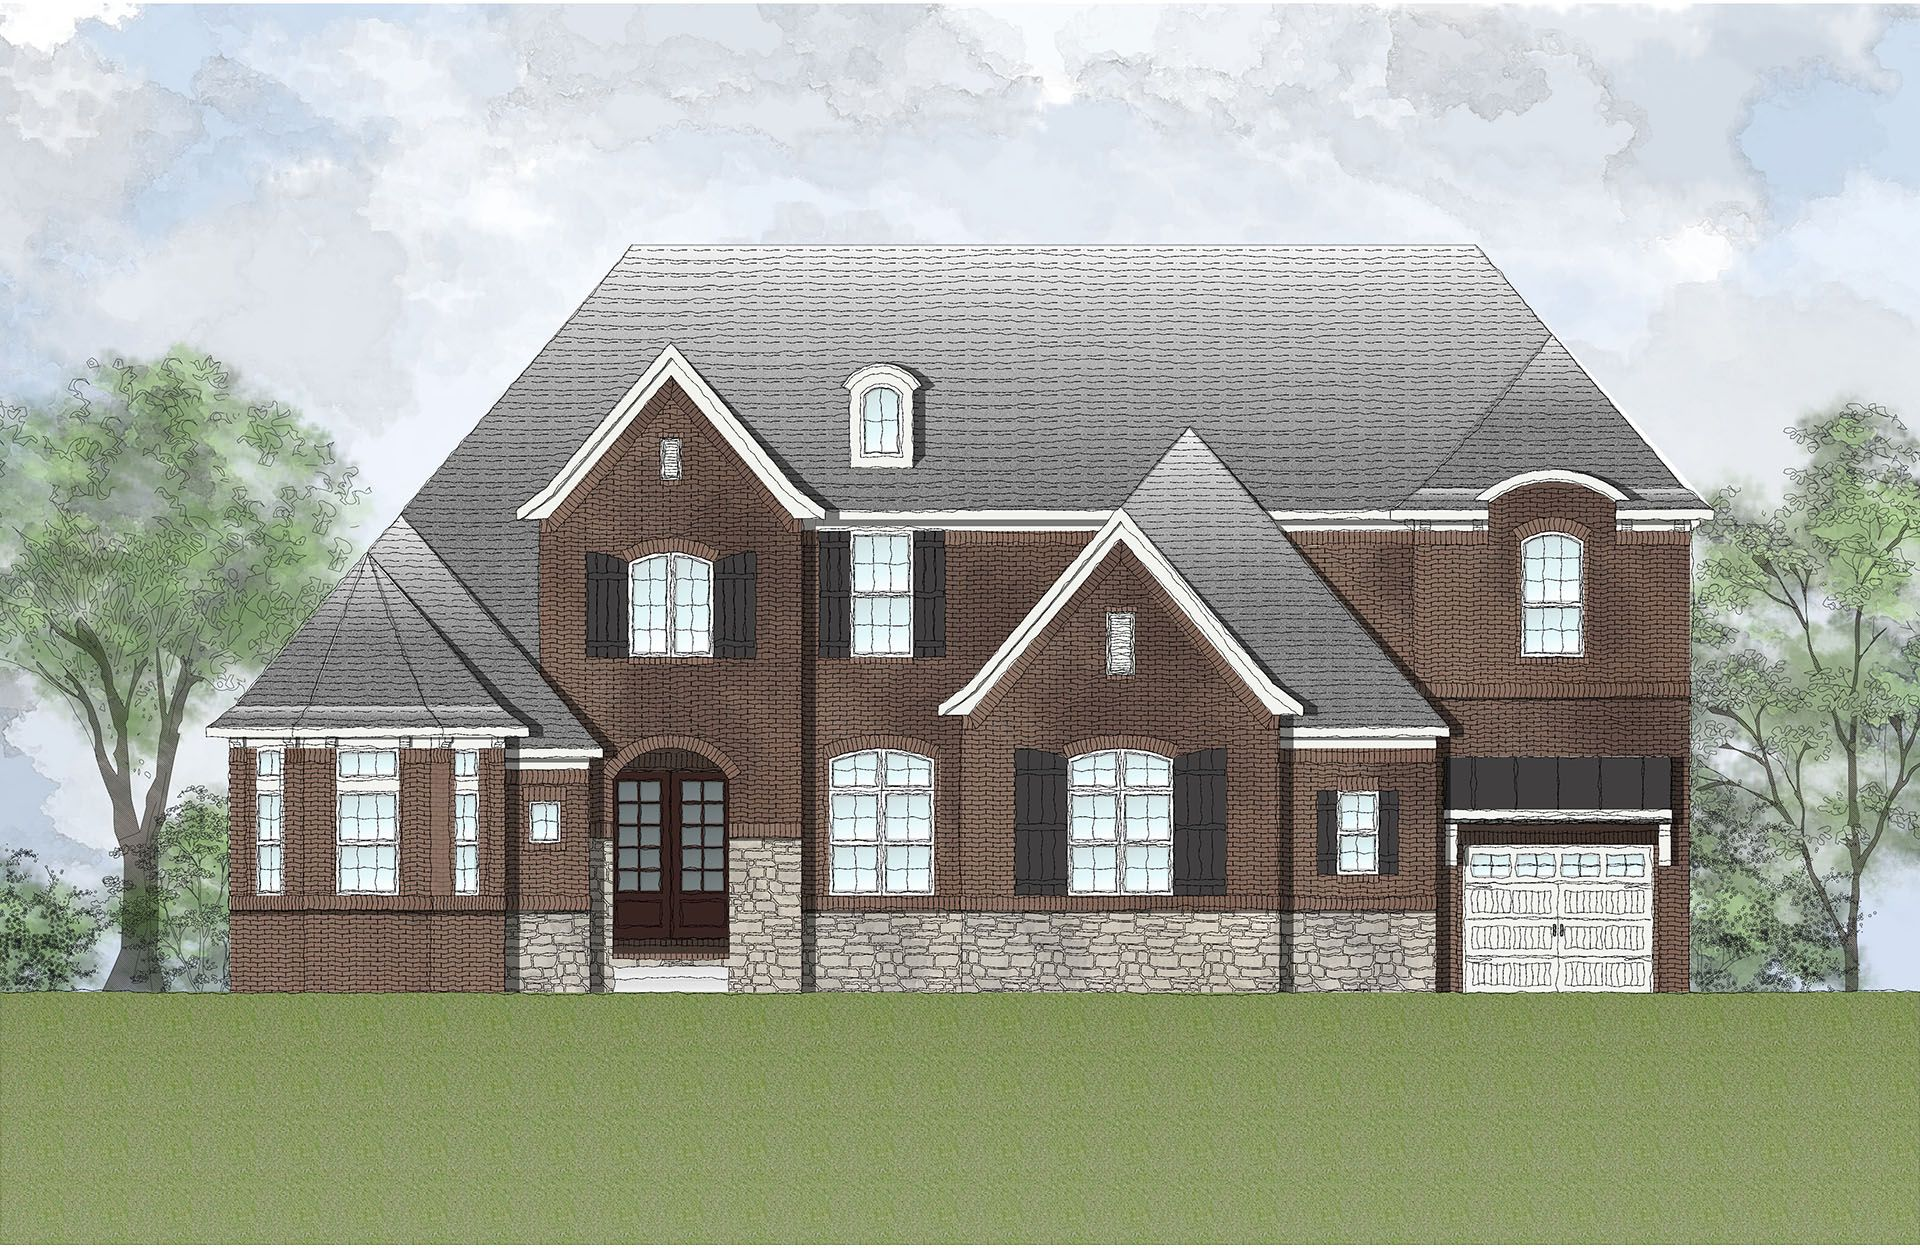 Single Family for Sale at Dresden 9485 Whetstone Blvd Nashville, Tennessee 37214 United States